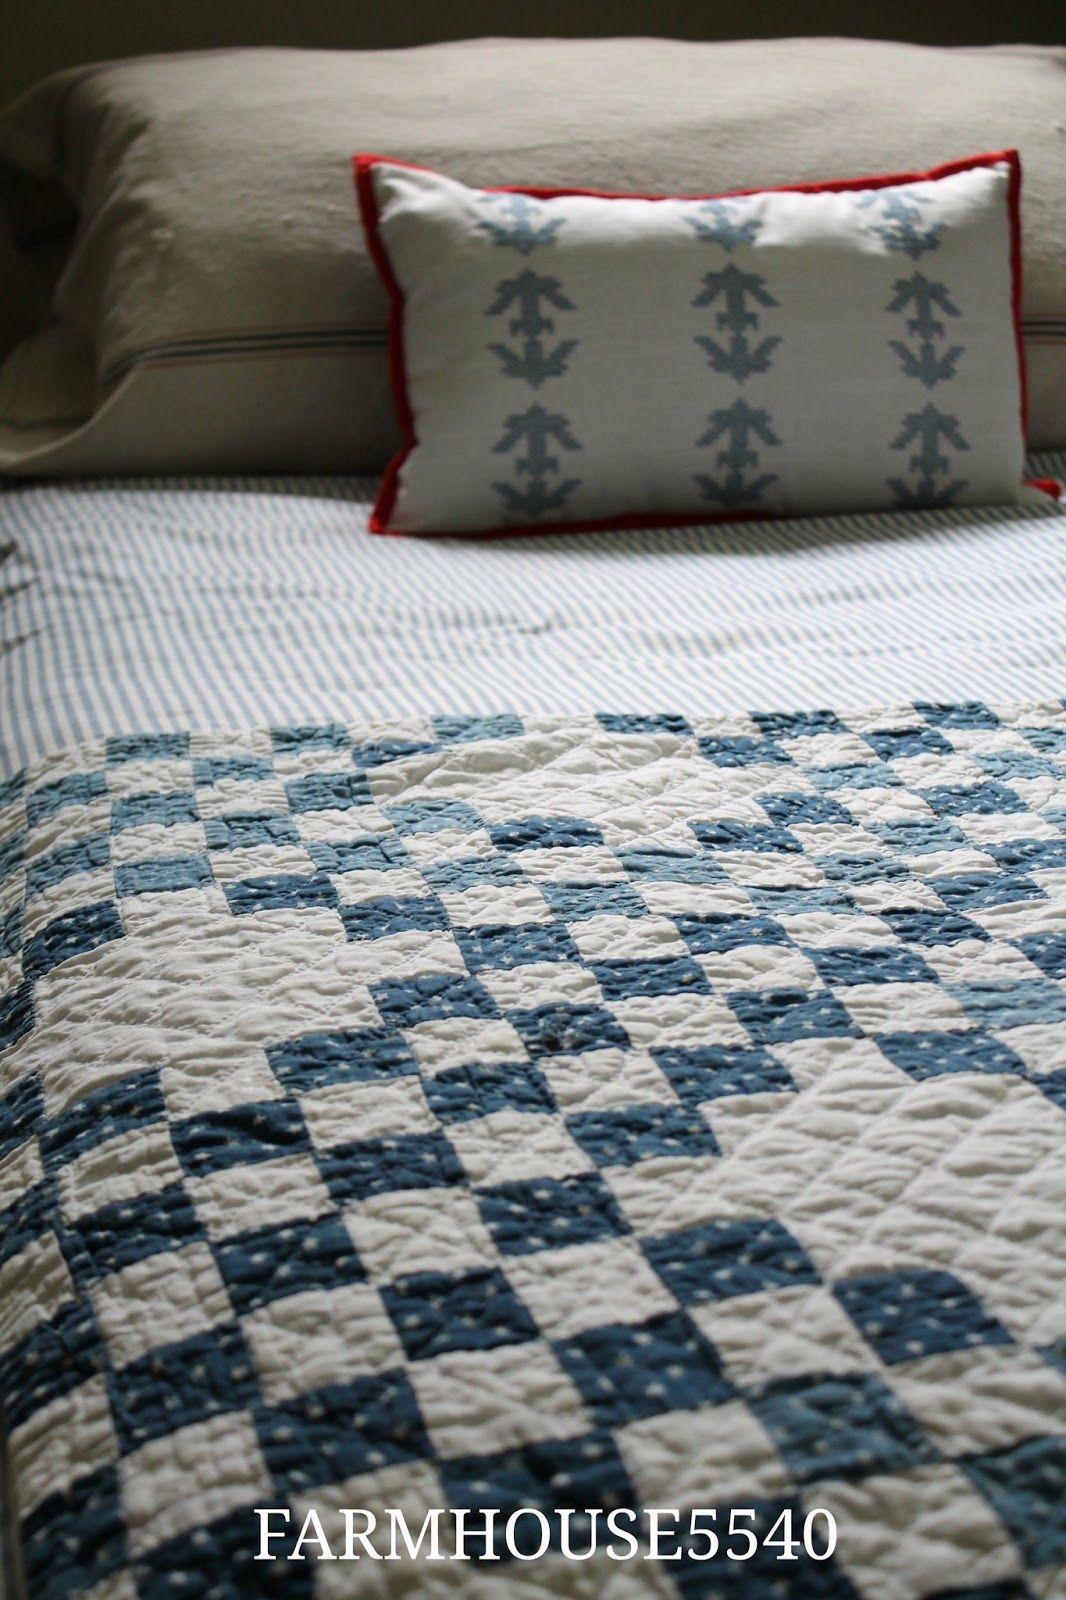 Farmhouse 5540 blue and red boys room farmhouse quilts